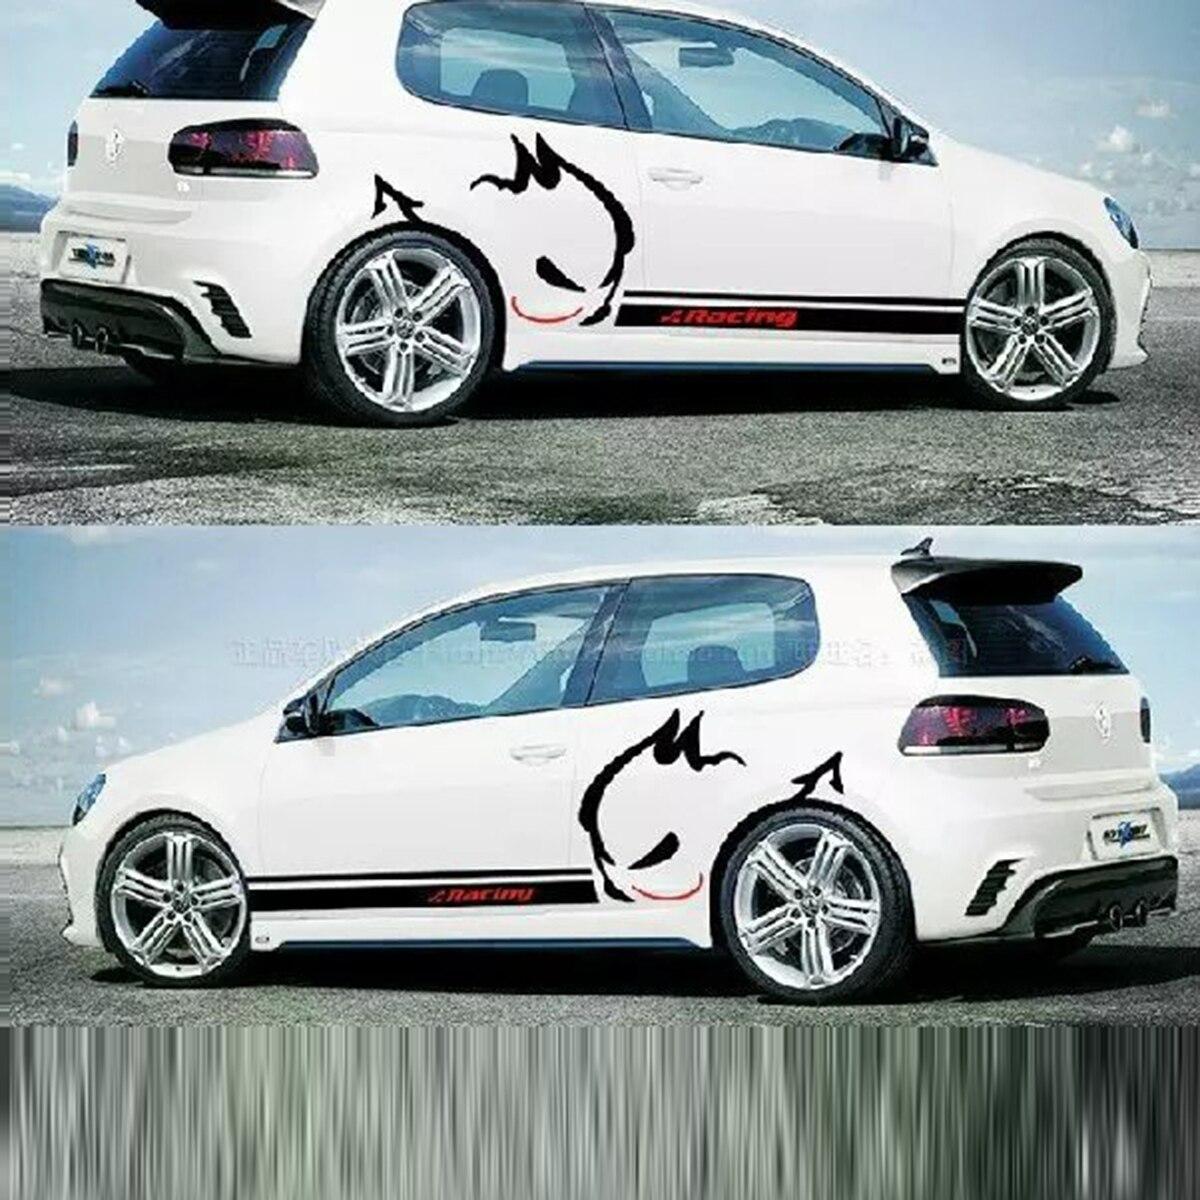 Car full body sticker design - Full Car Body Garland Decorative Body Decals Evil Rabbit Car Stickers For Vw Chevrolet Hyundai Bmw